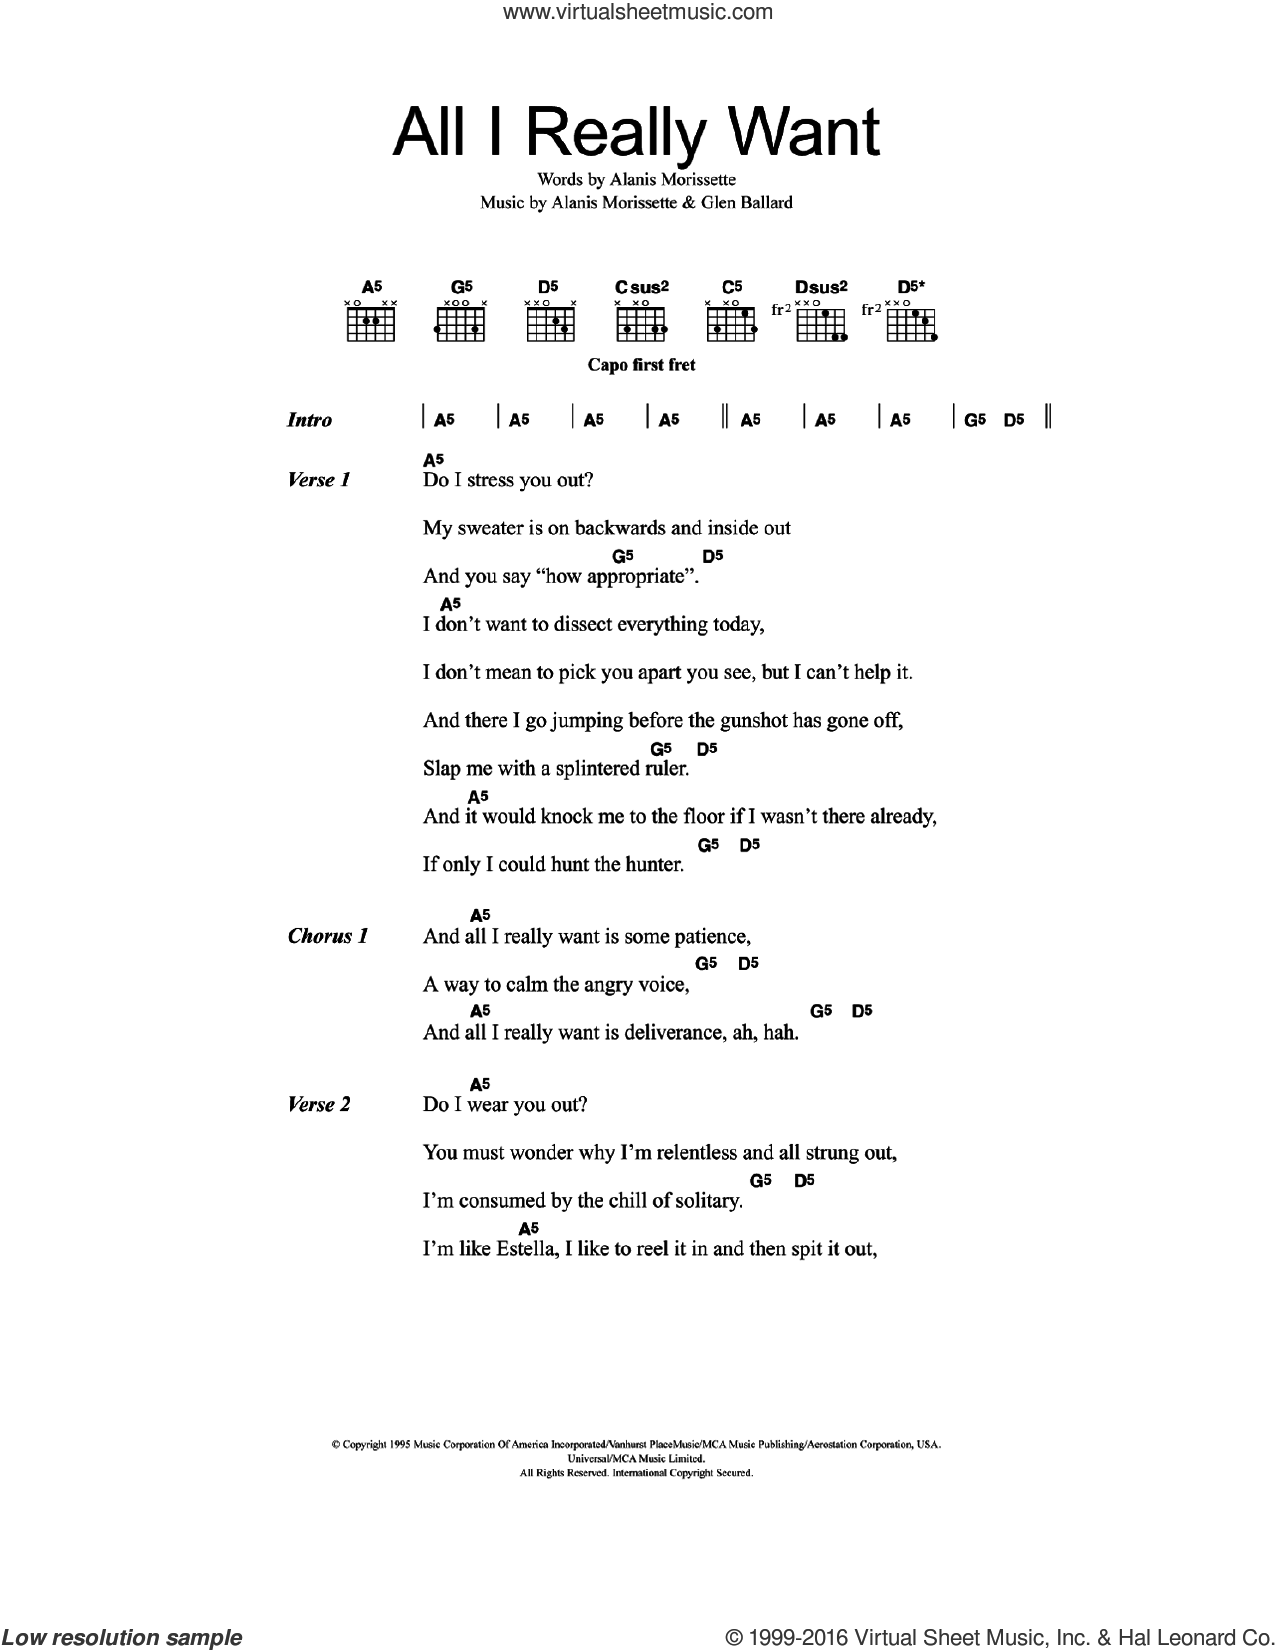 All I Really Want sheet music for guitar (chords) by Alanis Morissette and Glen Ballard, intermediate skill level